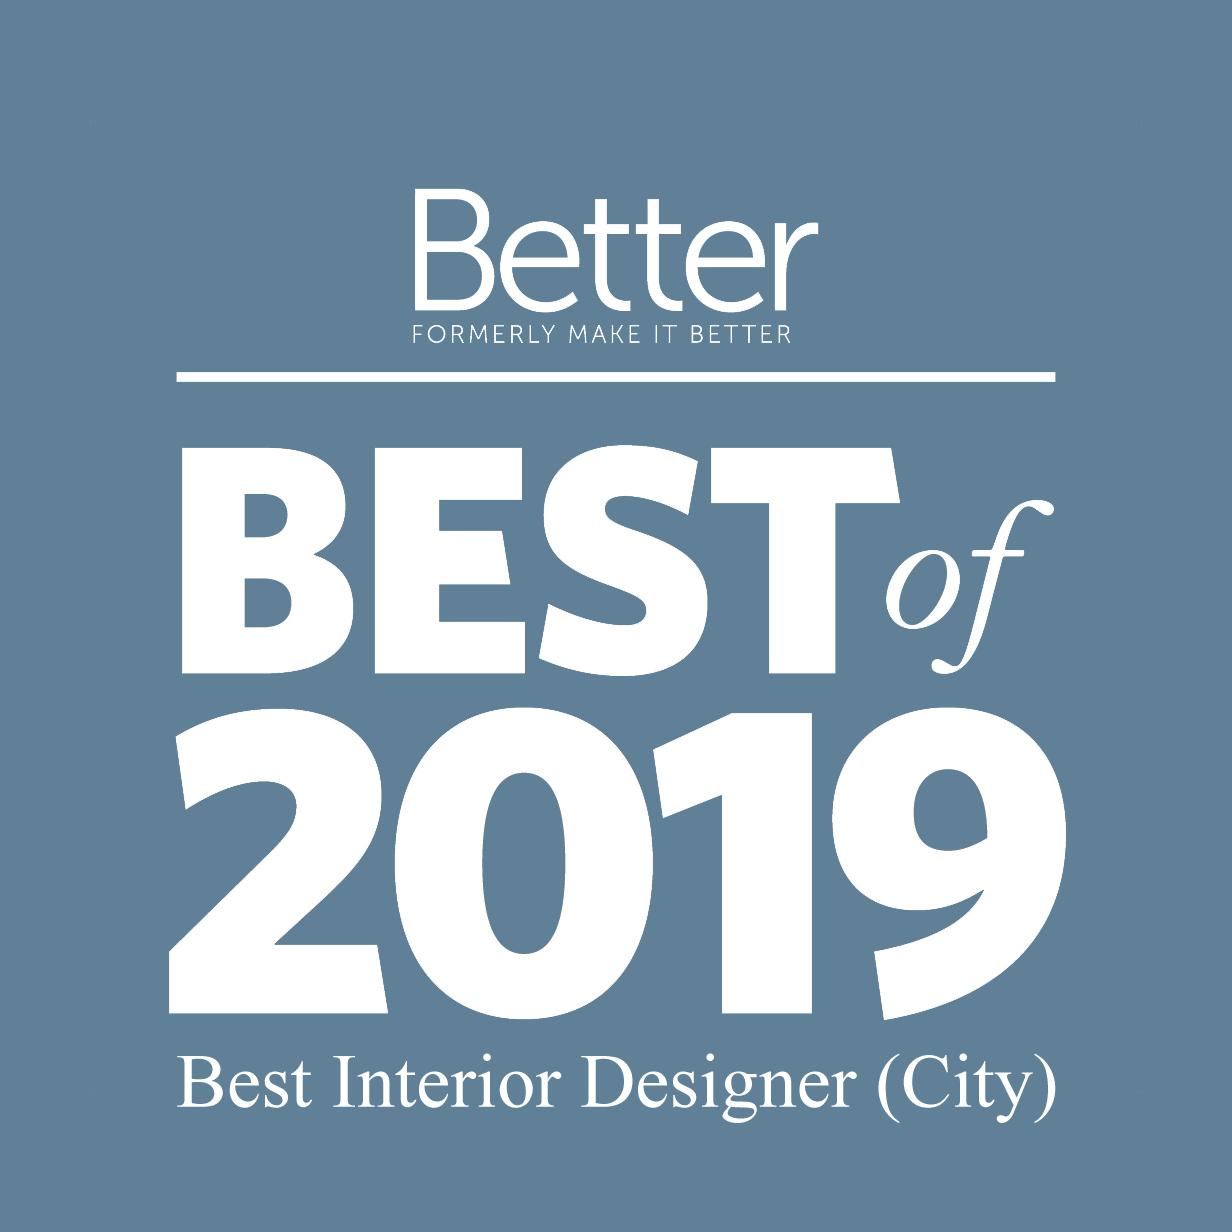 hilary-bailes-wins-best-of-2019-interior-designer-city.jpg